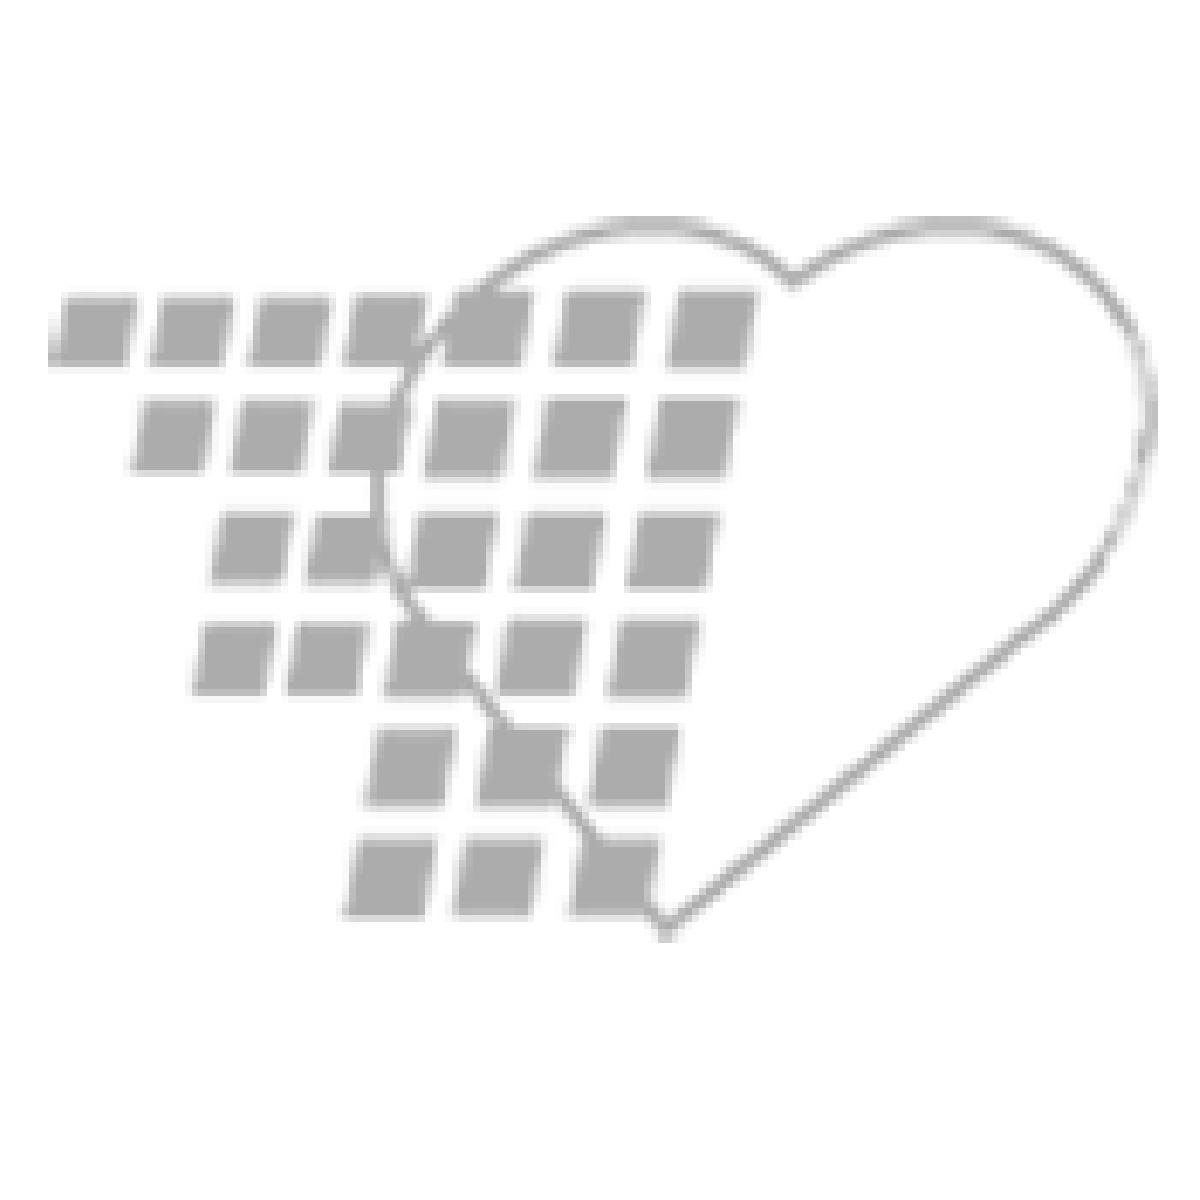 02-70-4080-LGADLT - Laryngoscope Miller Blade #4